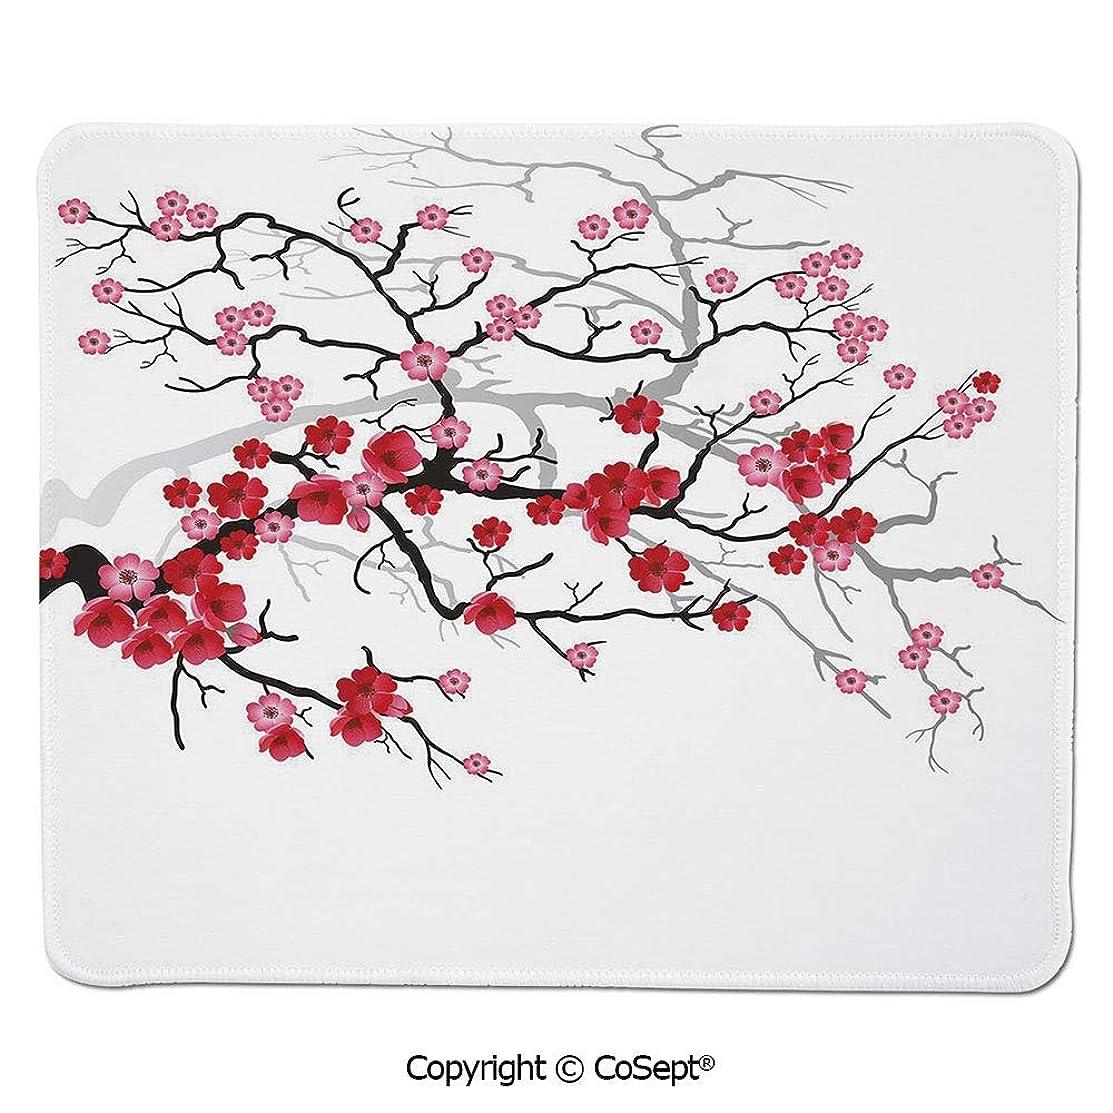 Non-Slip Rubber Base Mousepad,Japanese Plant Sakura Flower with Abstract Backdrop Art,for Laptop,Computer & PC (15.74